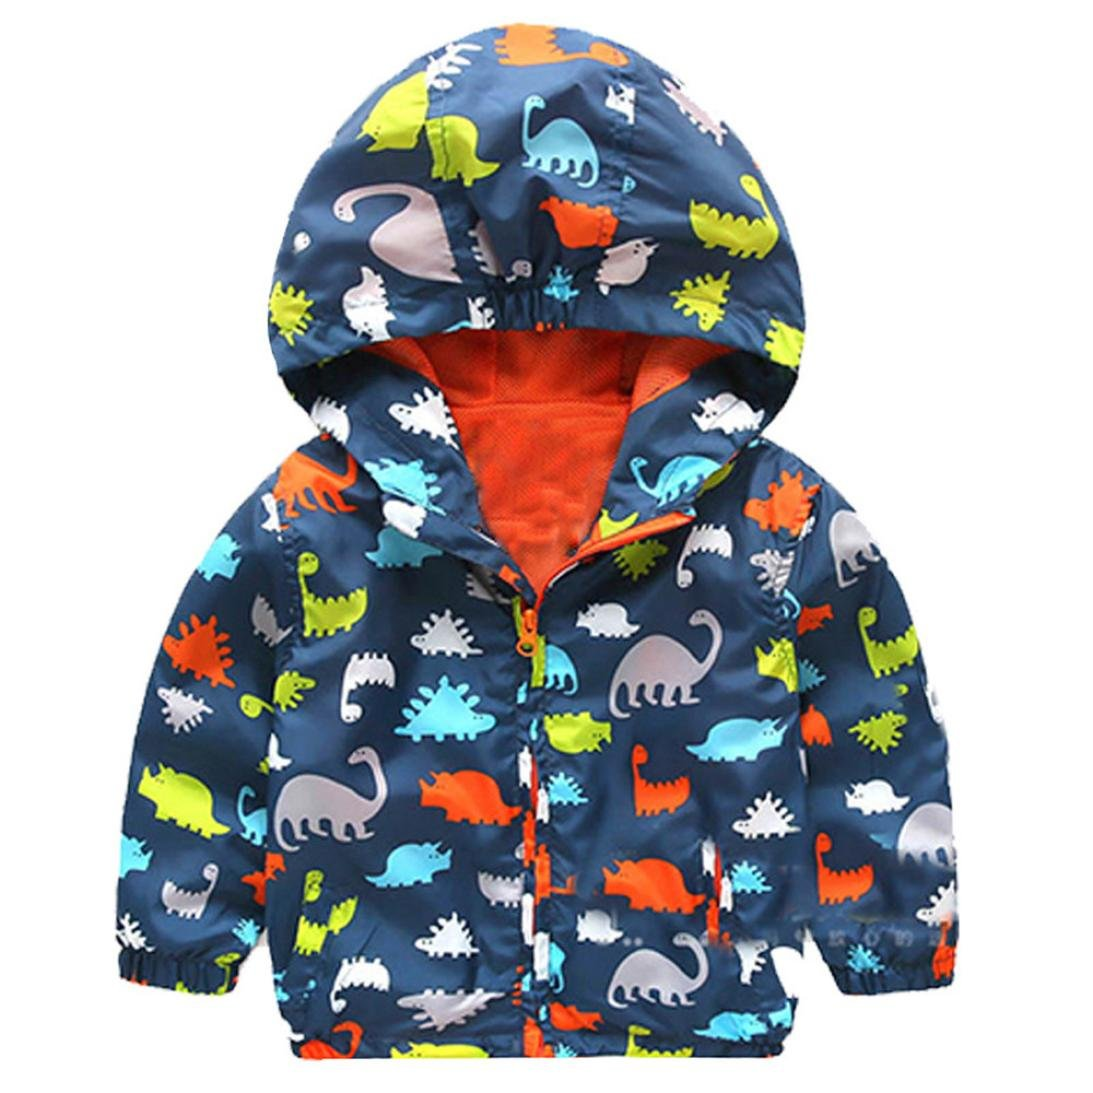 47383eb32 Amazon.com: vestitiy Toddler Kids Jacket Outwear, Infant Boys Girls  Dinosaur Zipper Hoodie Hooded Coat Children Clothes: Clothing